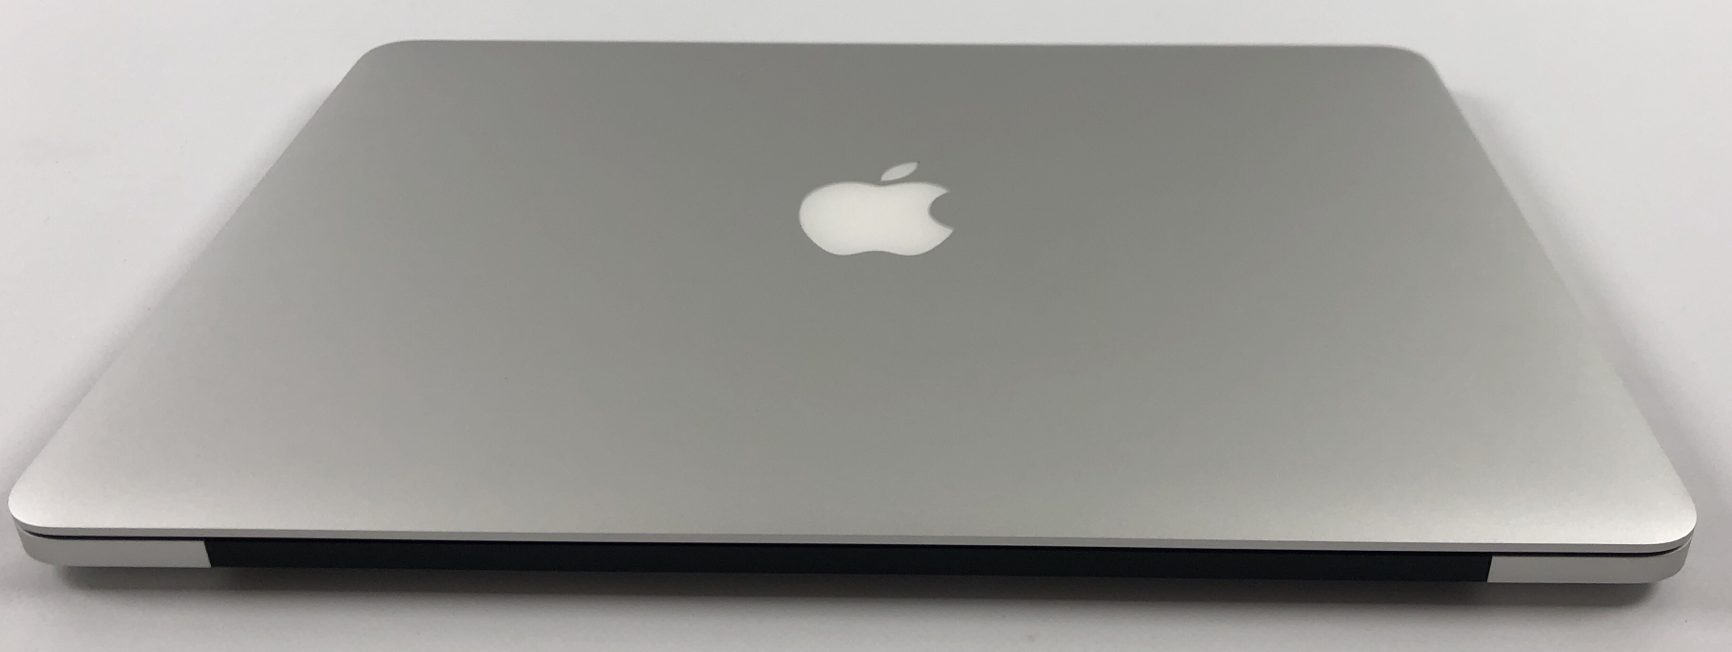 "MacBook Pro Retina 13"" Early 2015 (Intel Core i5 2.9 GHz 16 GB RAM 512 GB SSD), Intel Core i5 2.9 GHz, 16 GB RAM, 512 GB SSD, image 2"